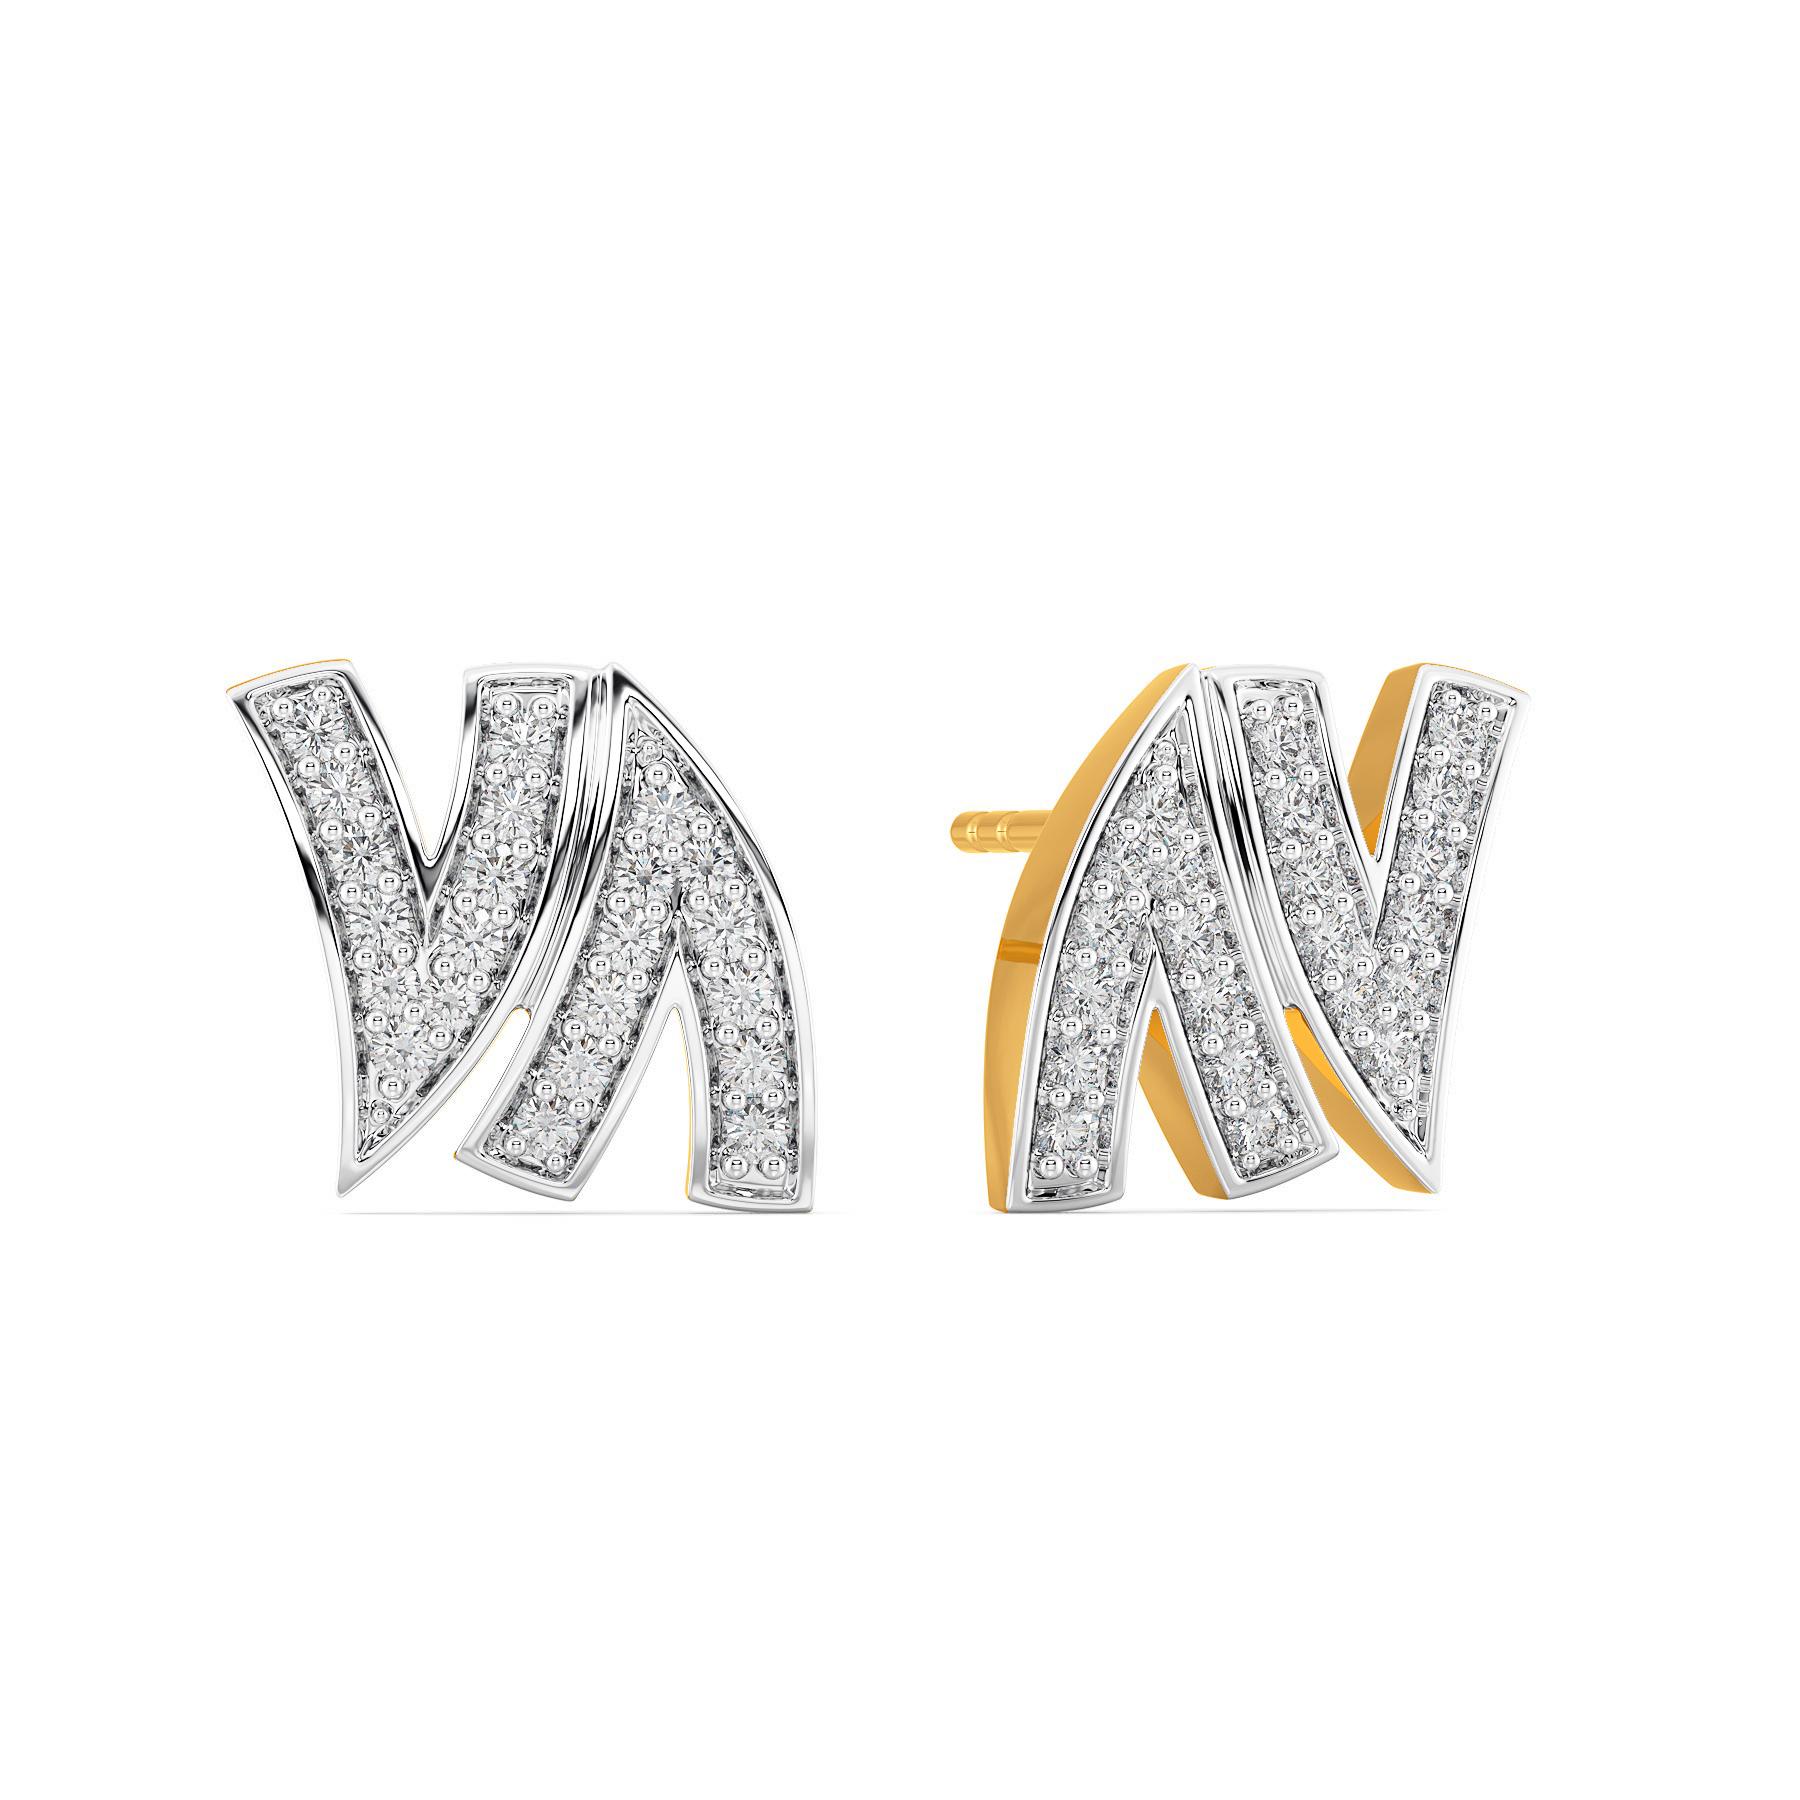 Work Vocation Diamond Earrings